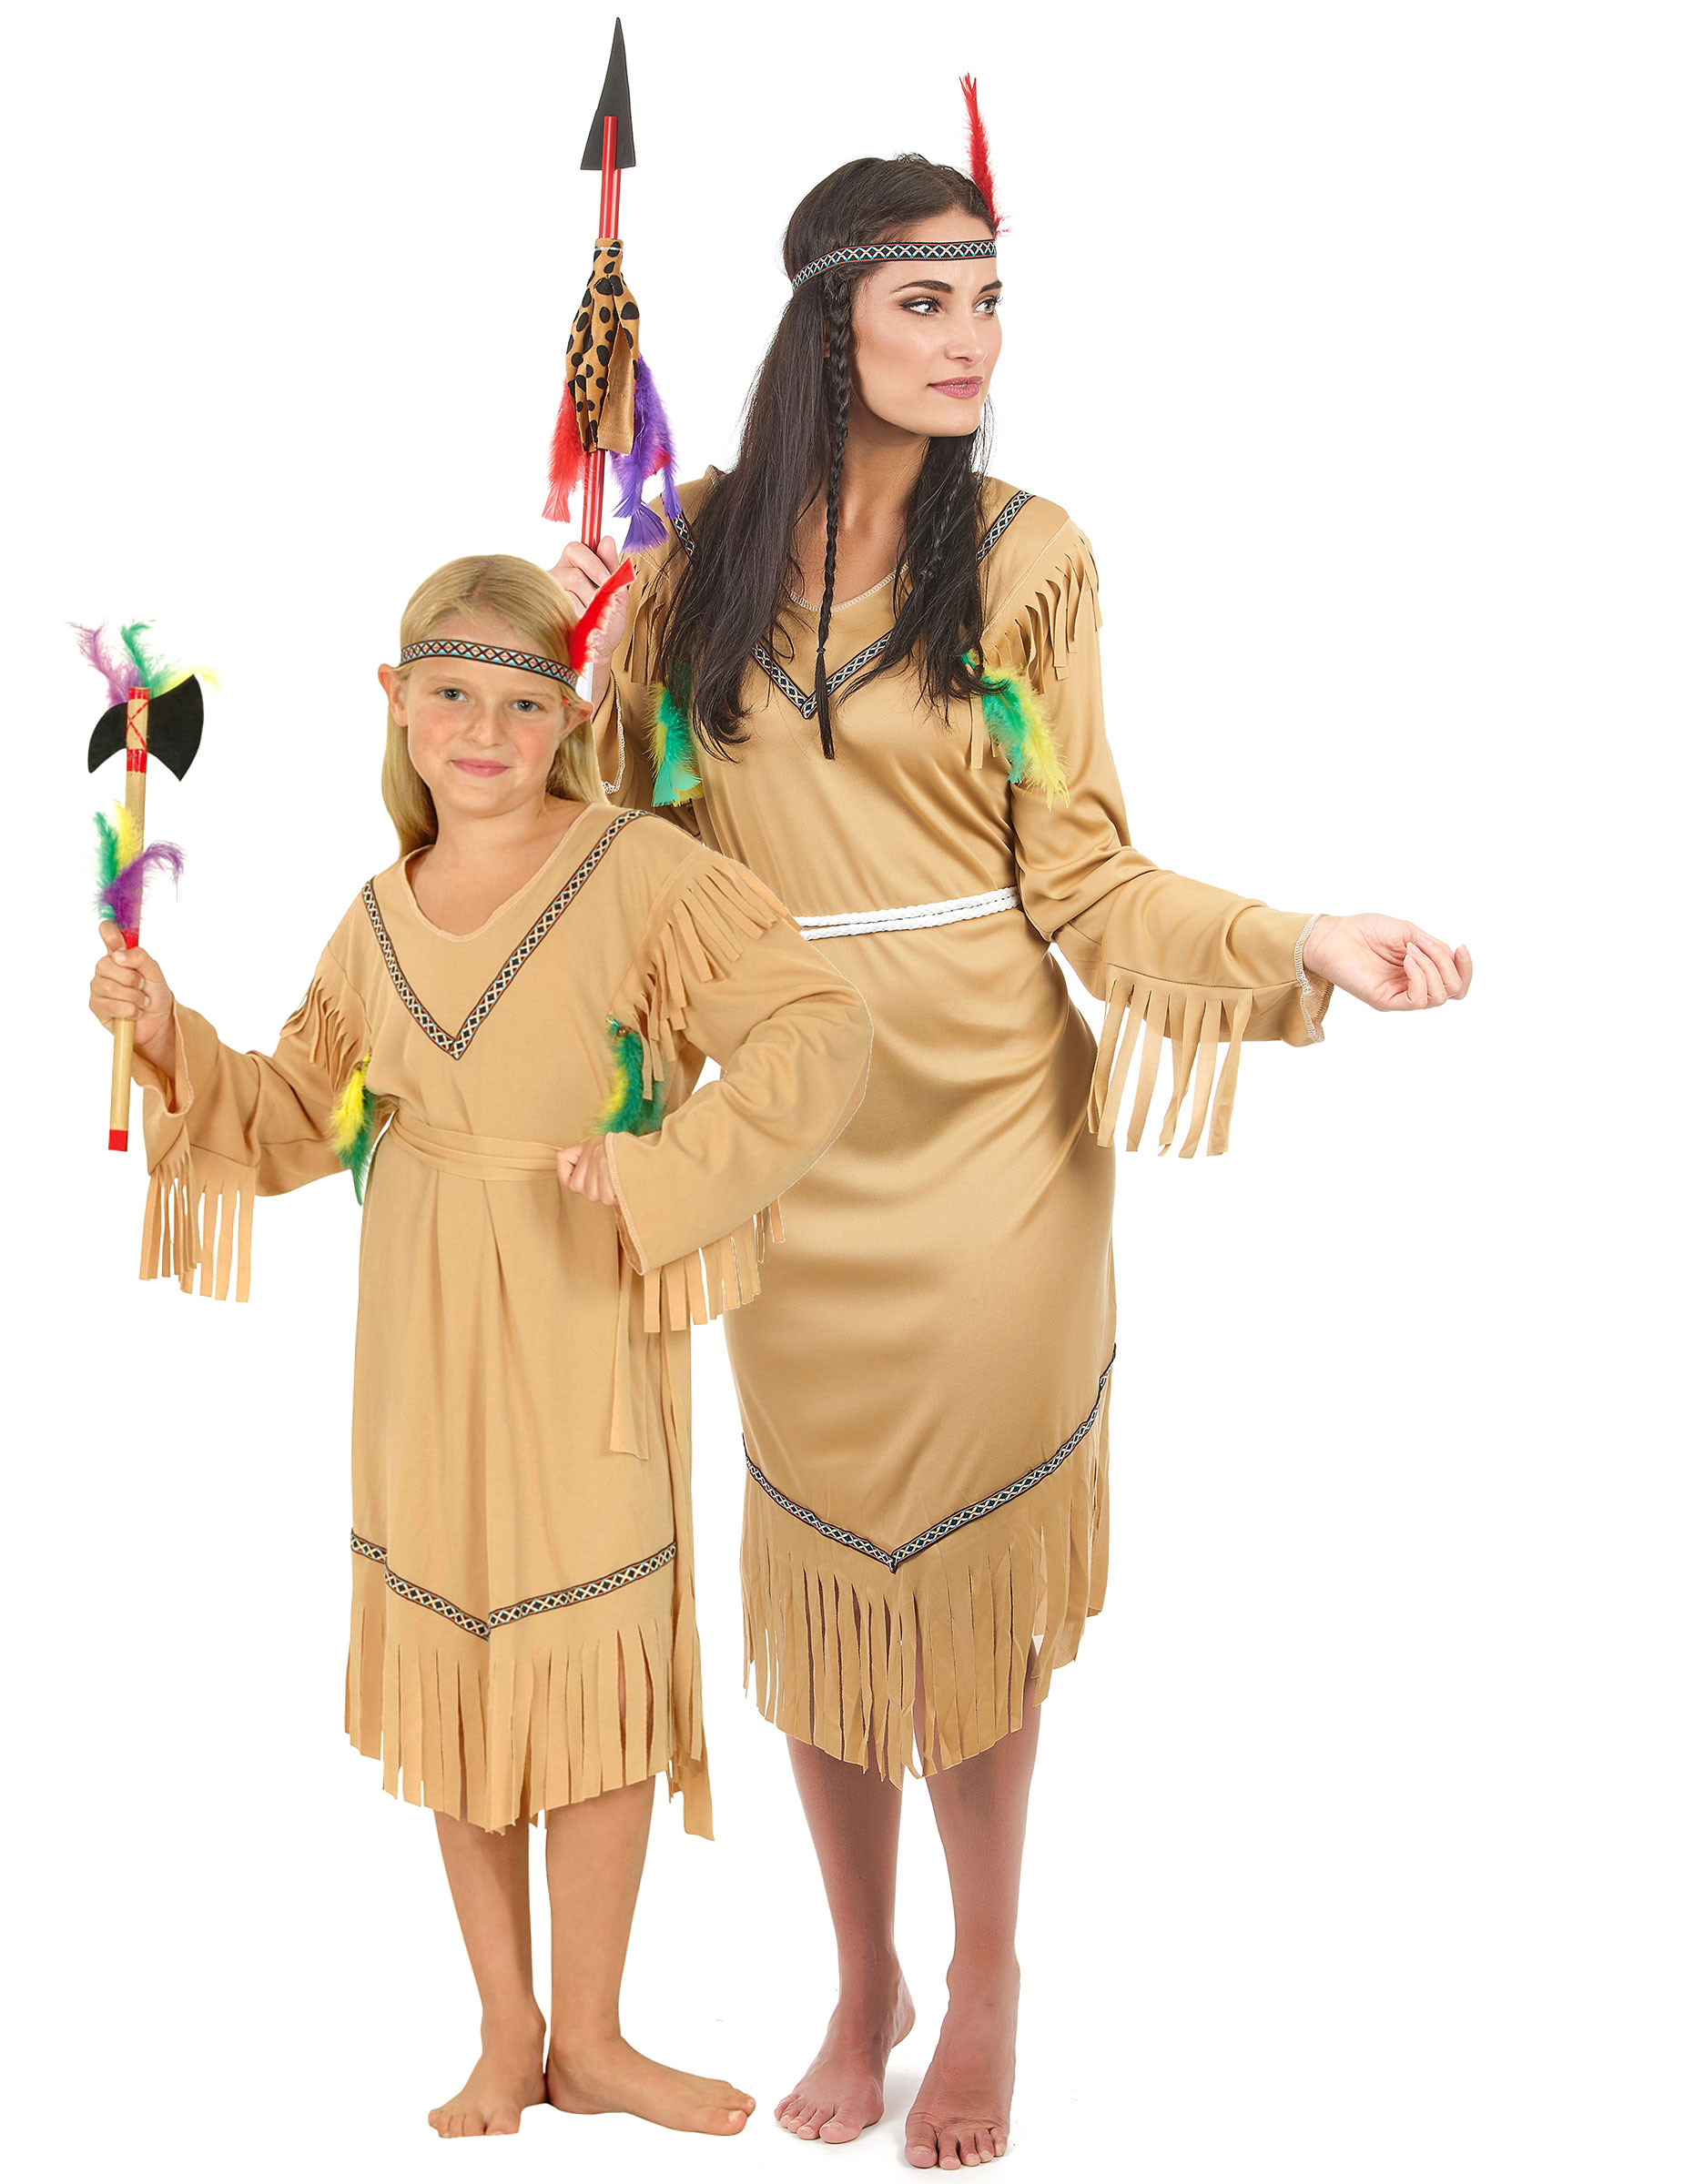 Pin disfraz india disfraces carnaval original plementos - Disfraces carnaval original ...